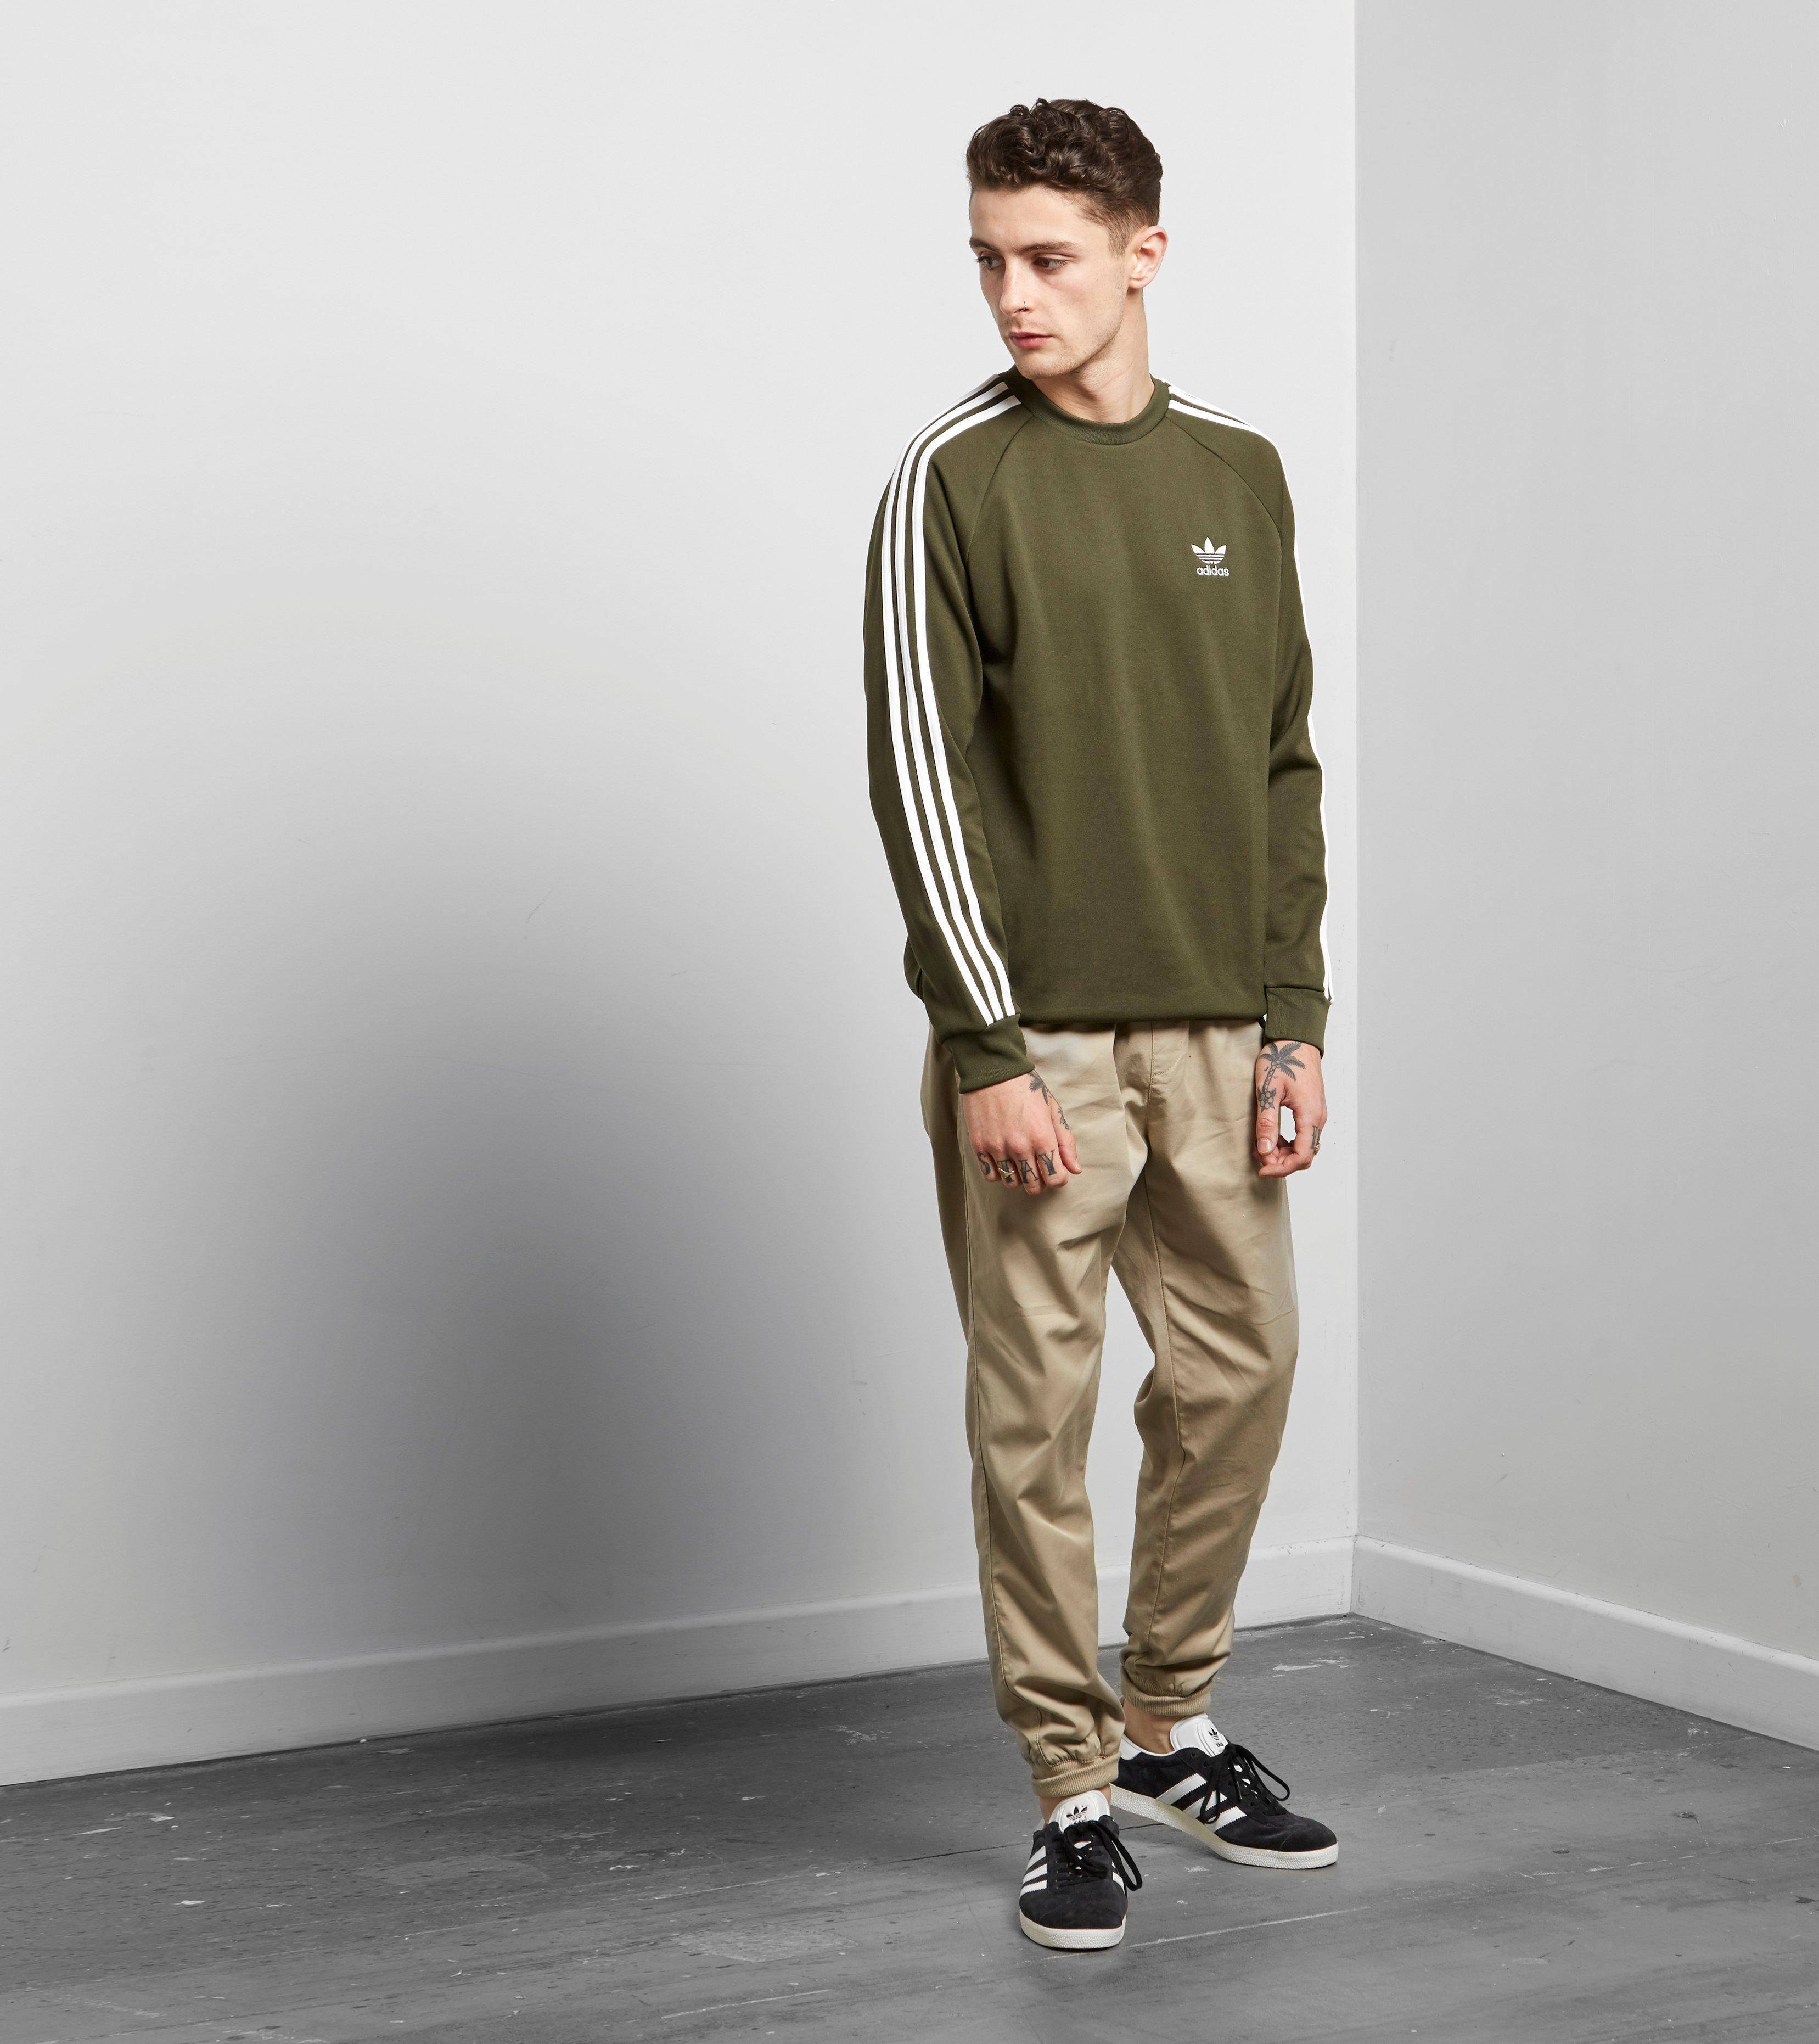 Lyst Sweatshirt In Originals For Adidas Men Crew California Green fy6Yb7g